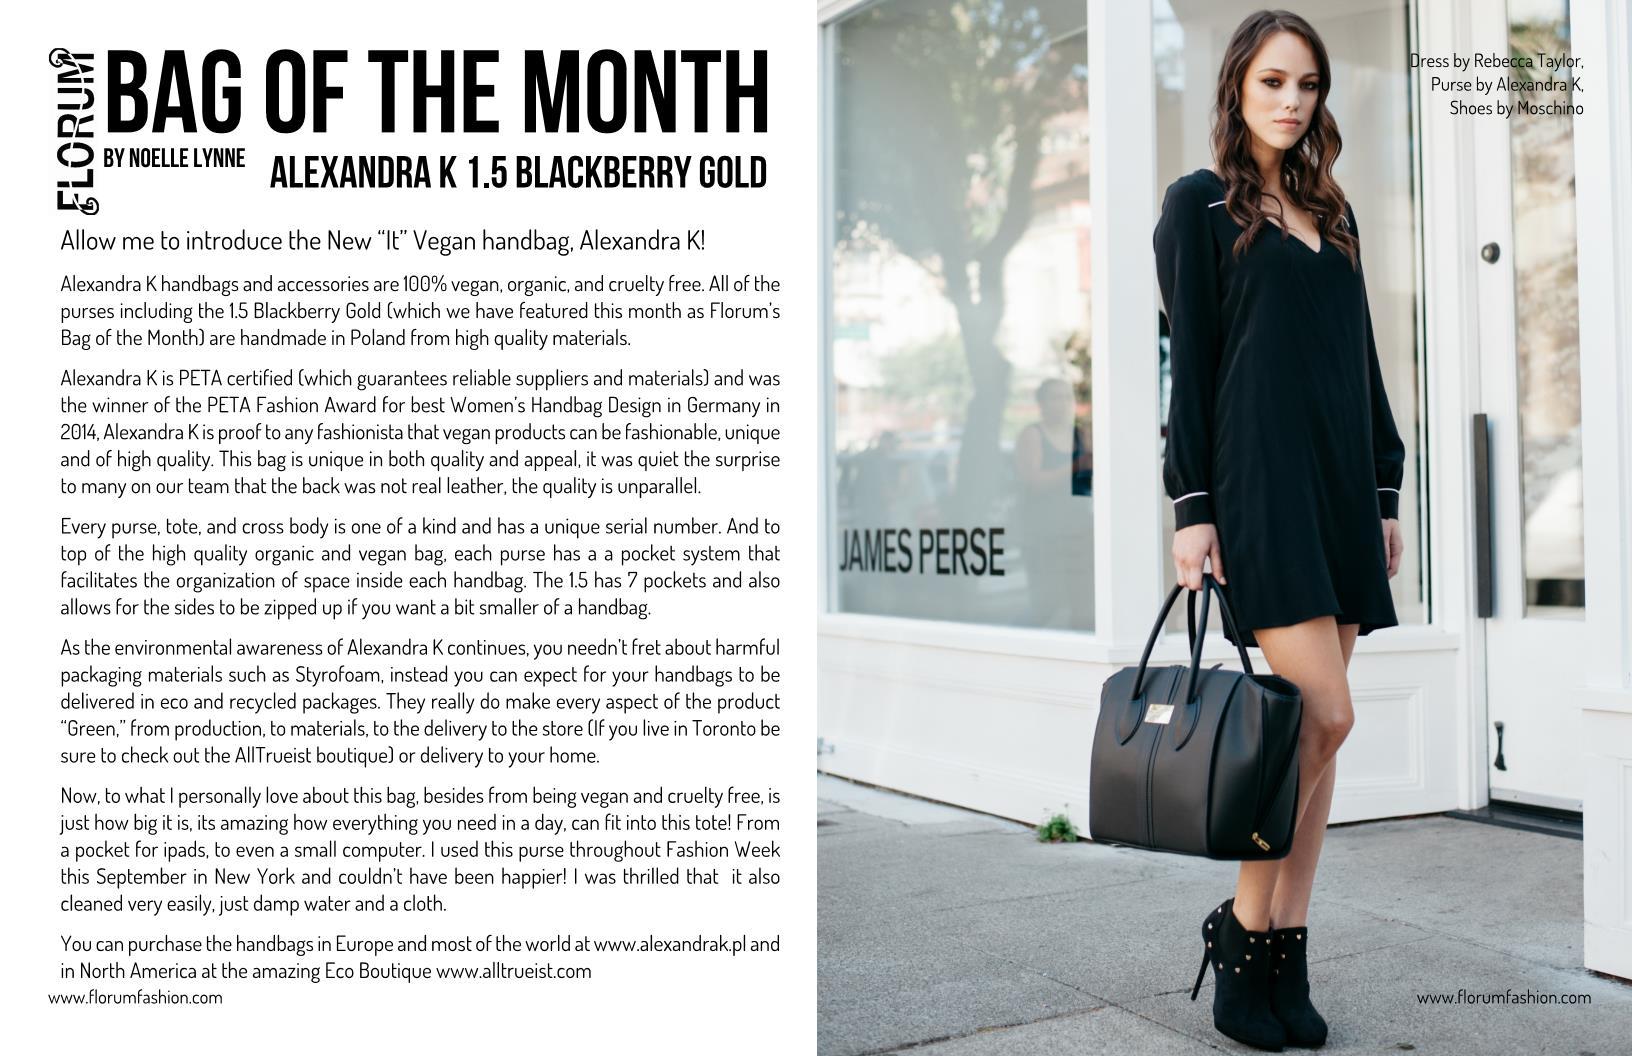 Noelle Lynne Florum fashion magazine Bag of the month Alexandra K vegan purse Cate Chant Ethical Handbag